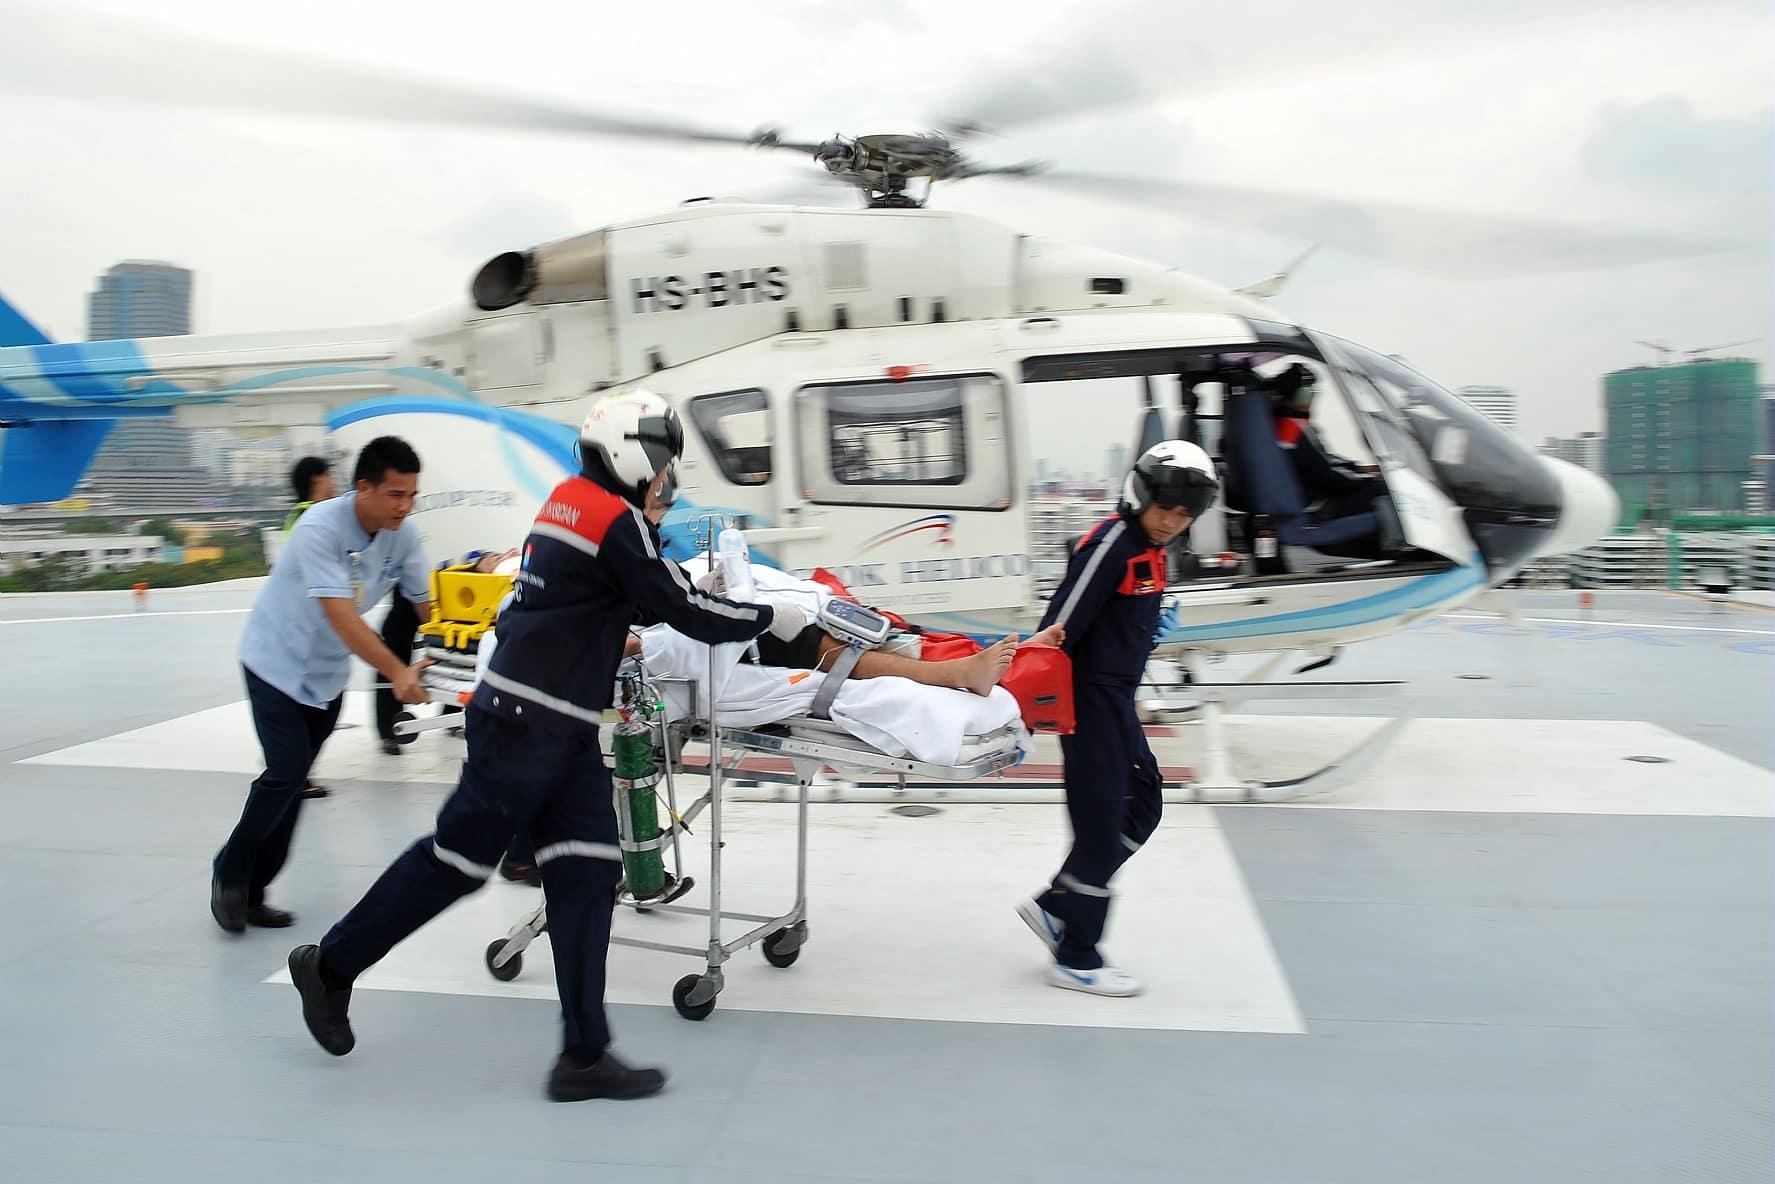 transport médicale assurance voyage